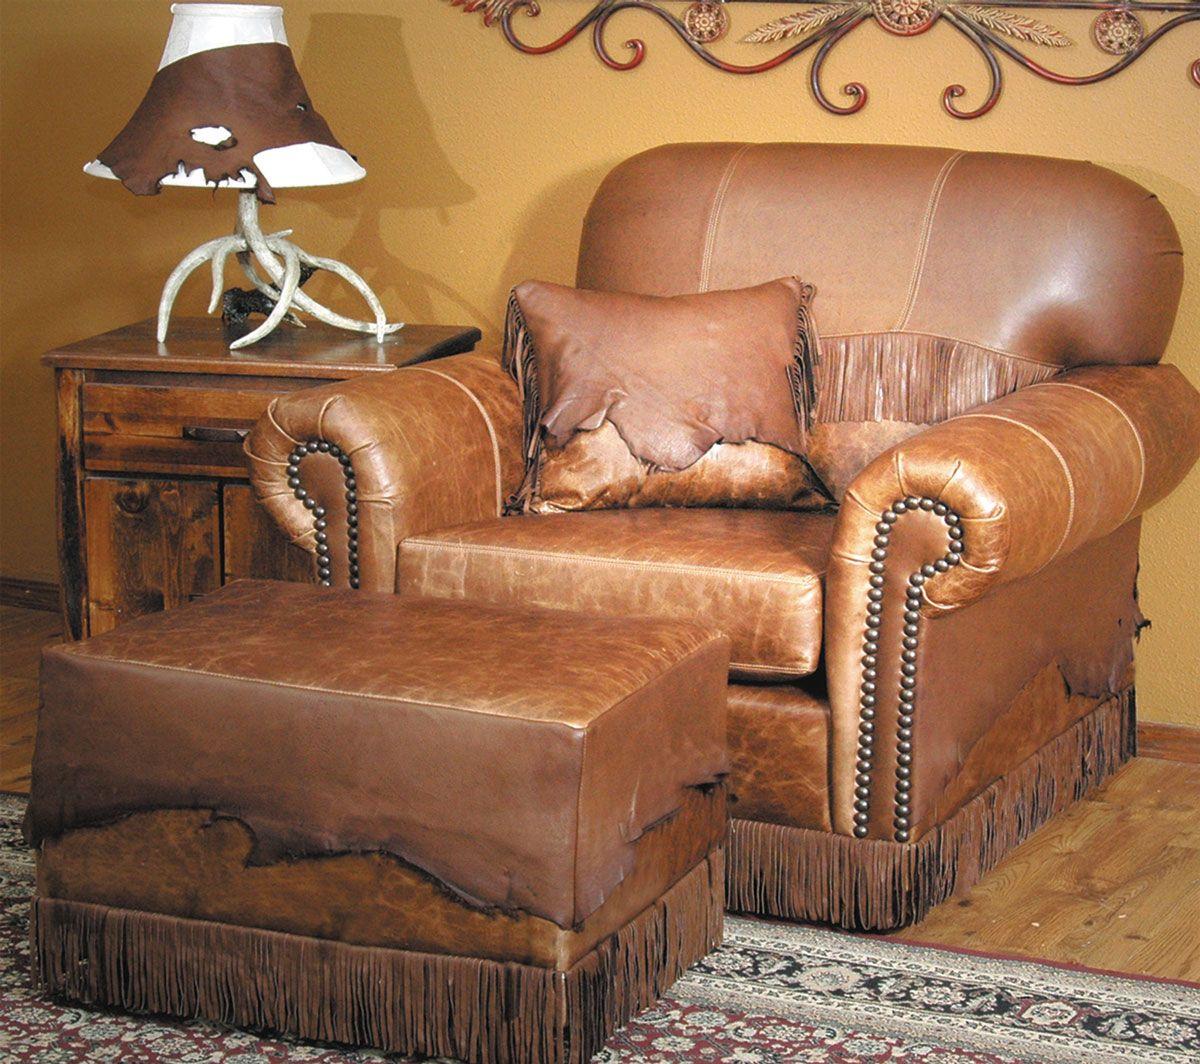 Rustic Lodge Decor Lodgesdecorcabinrusticdecorlodgemission - Western decor ideas for living room